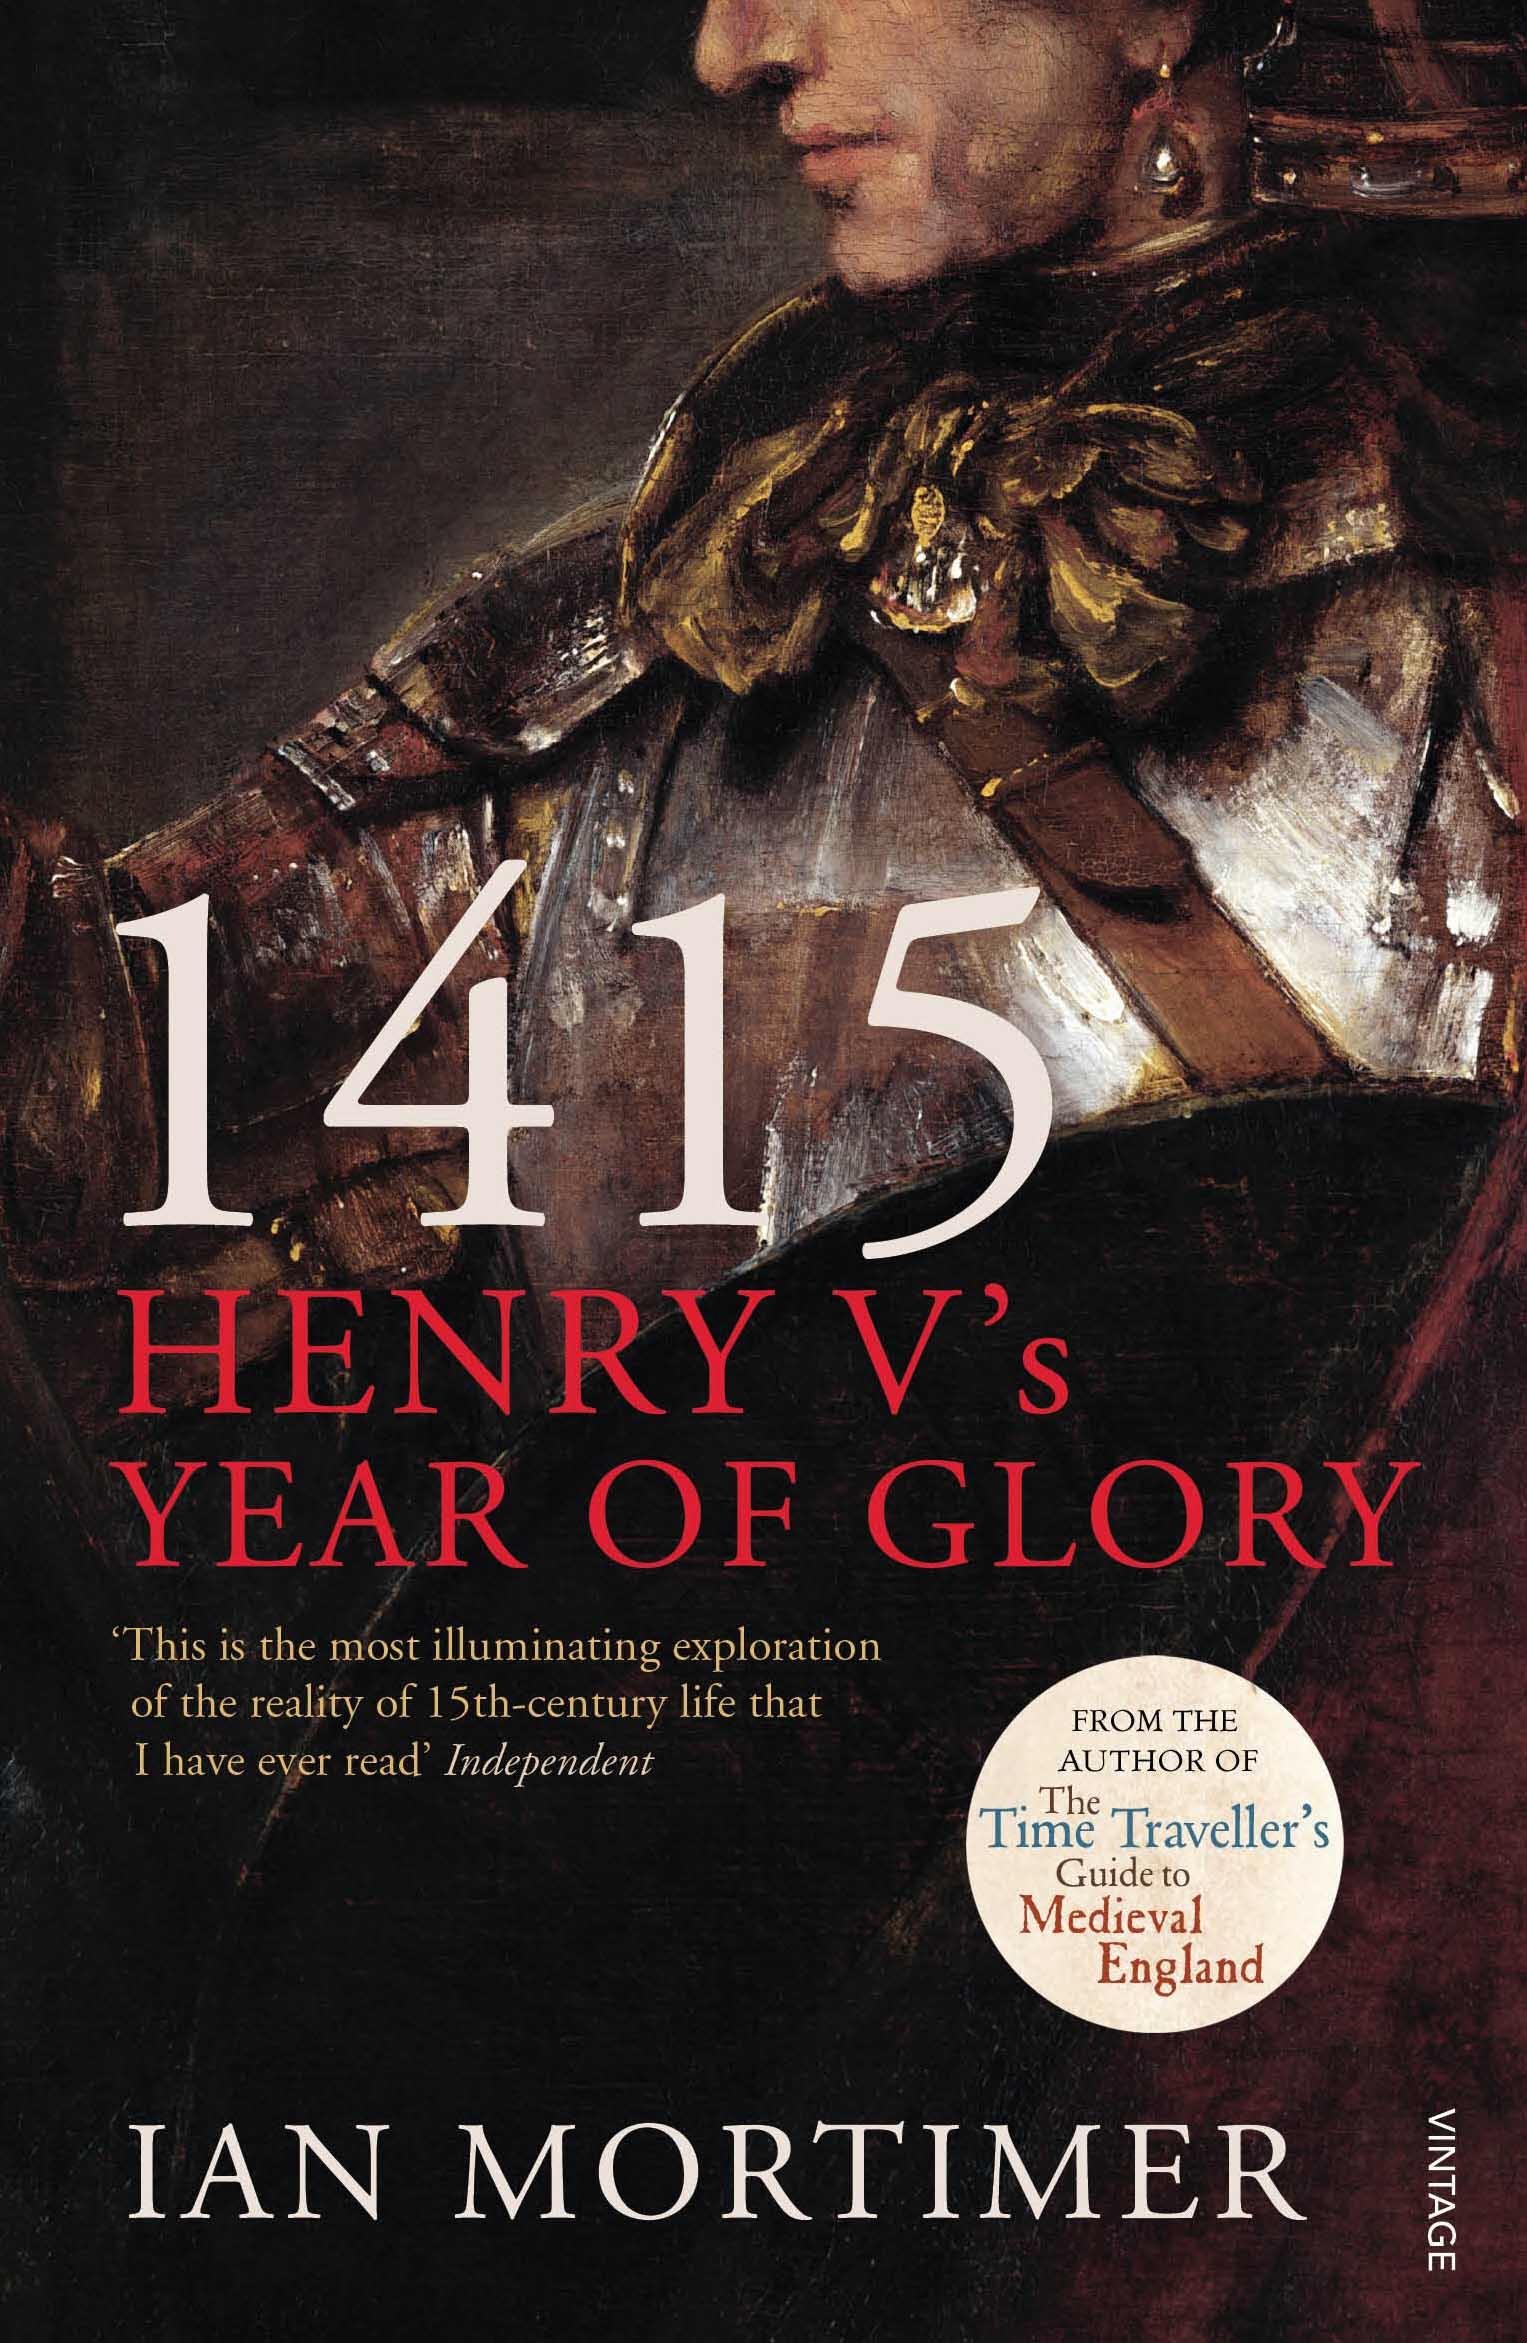 1415: Henry V's Year of Glory